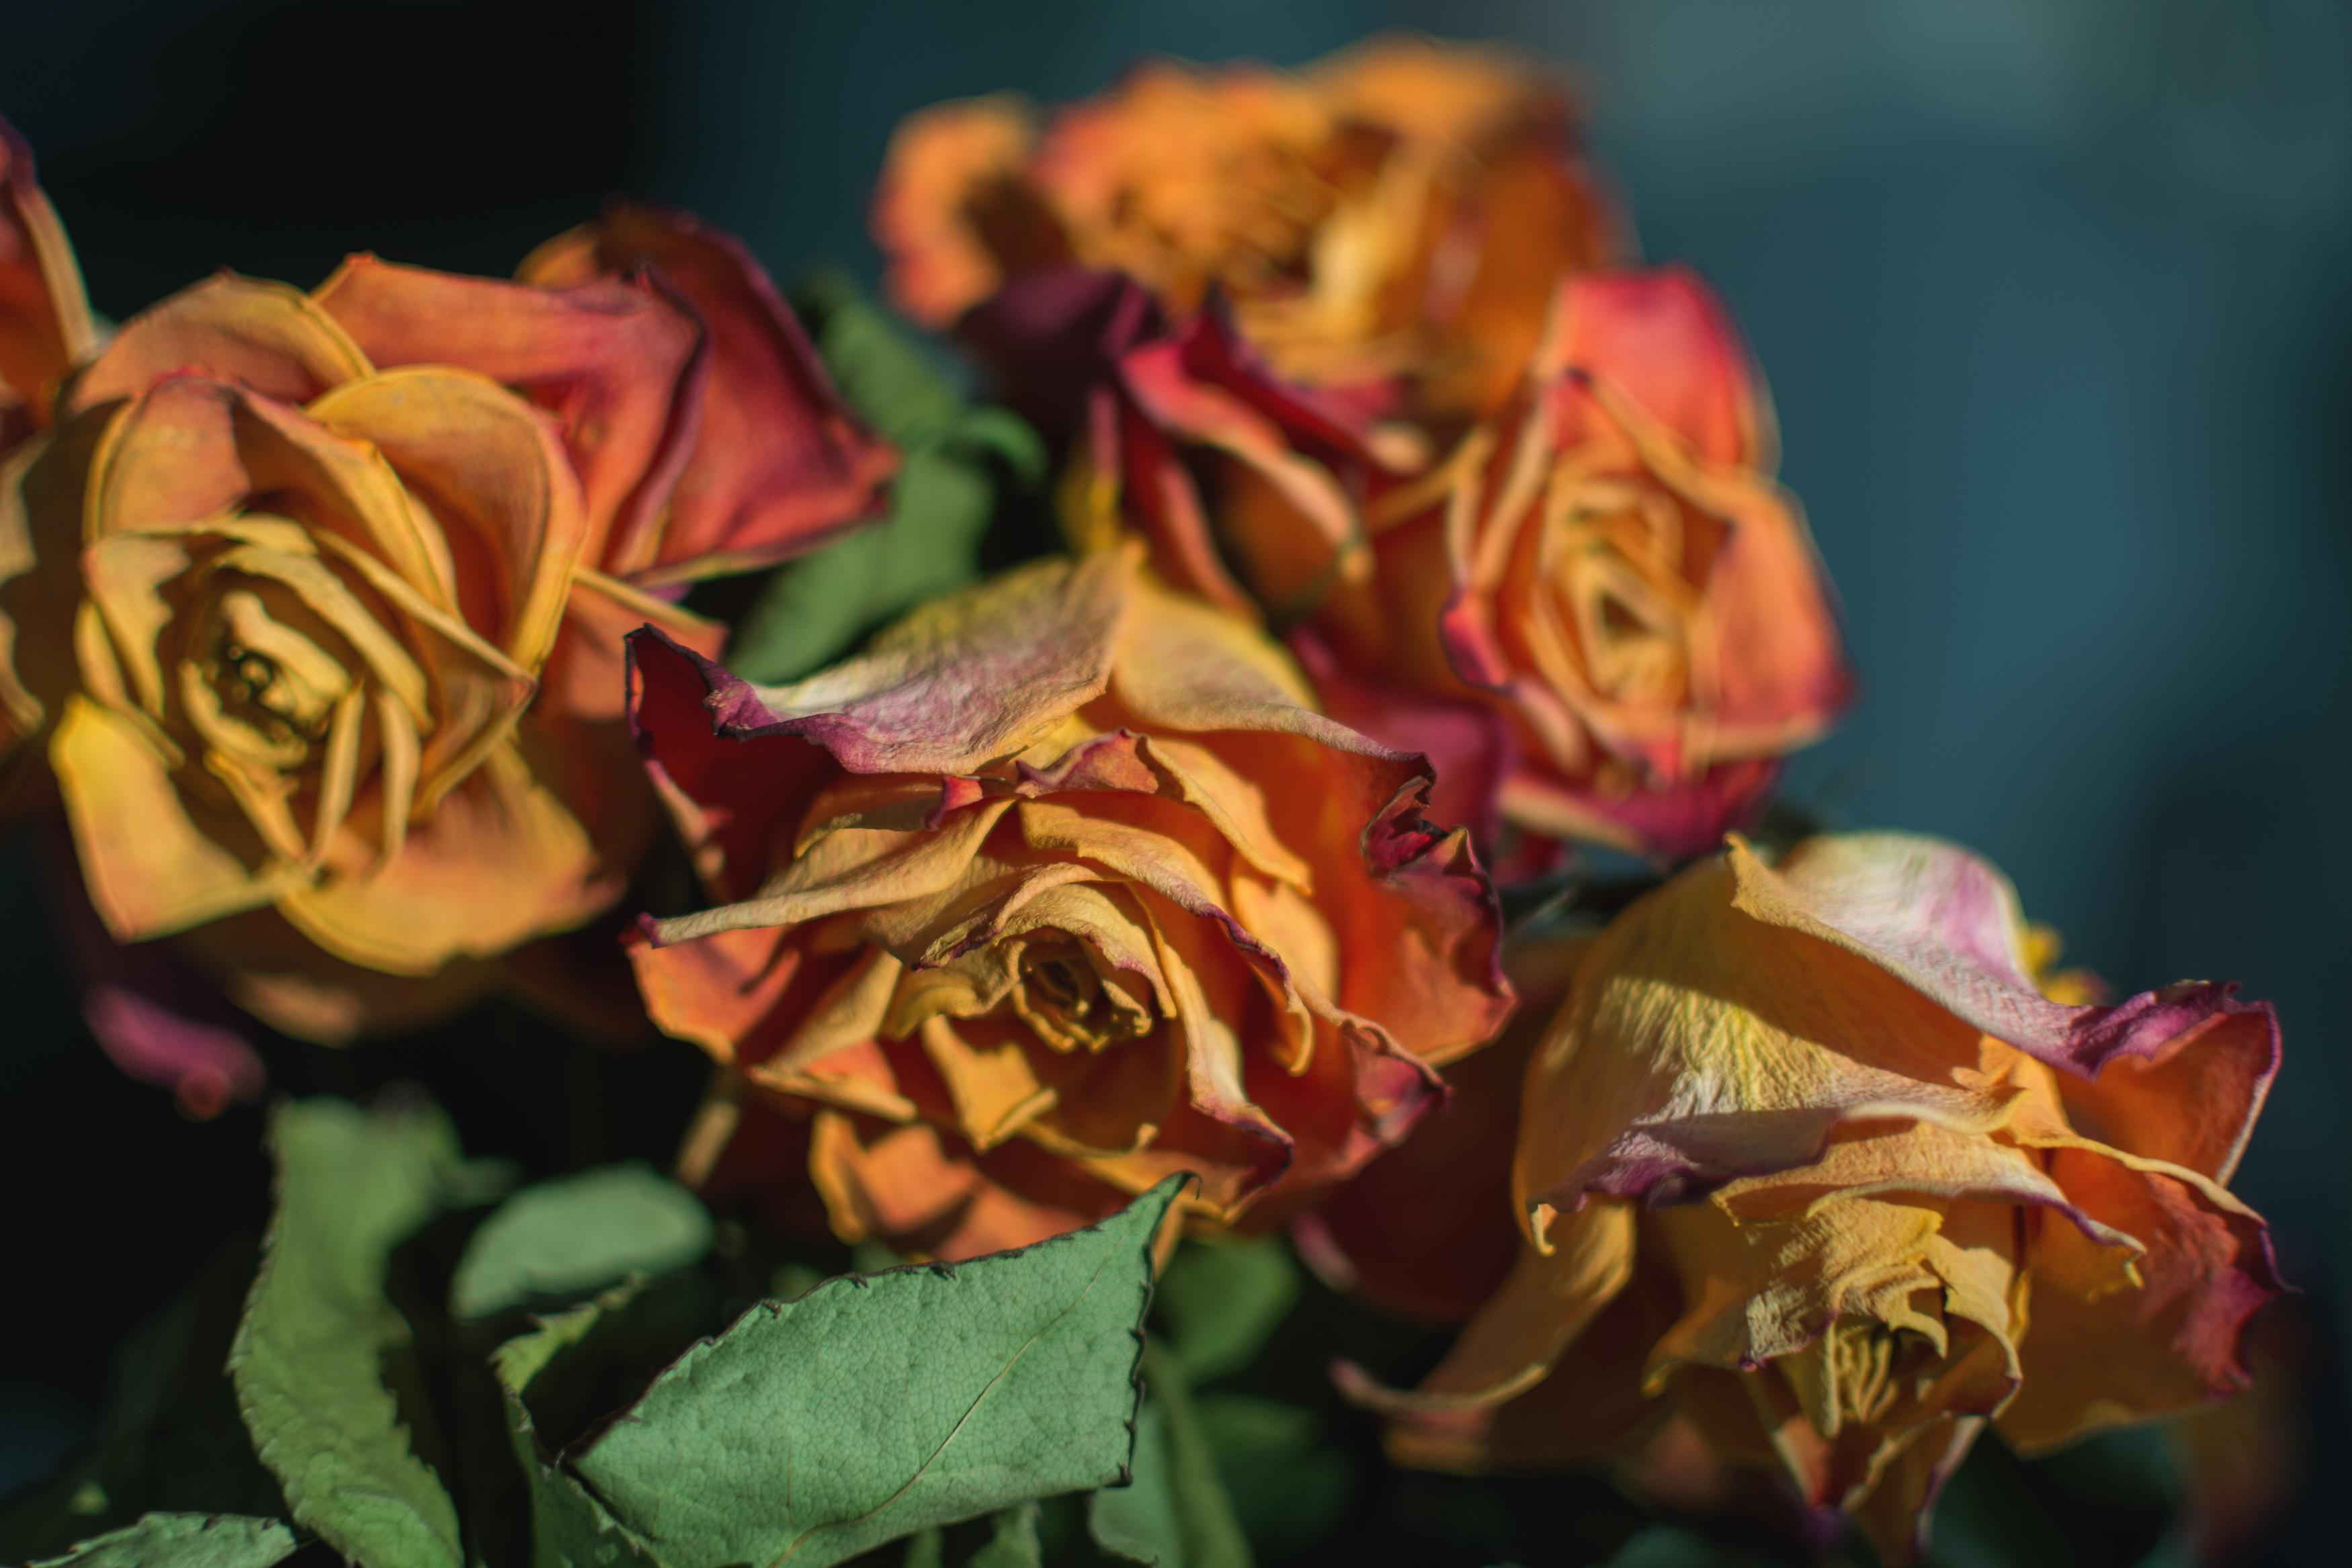 FREE IMAGE: Dry Roses - Libreshot Public Domain Photos